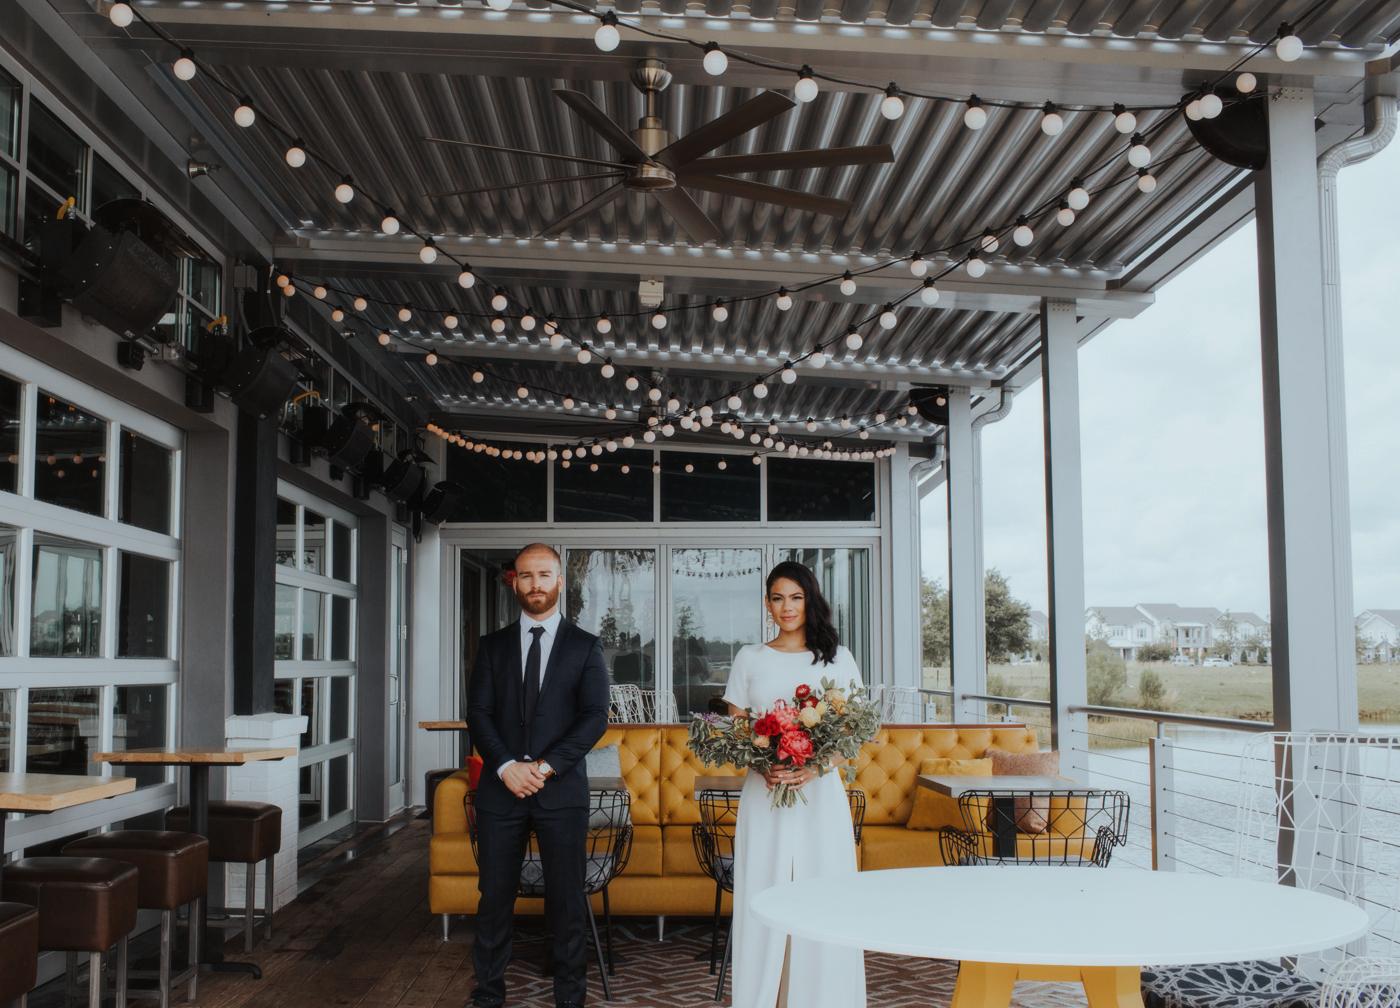 Wedding | Canvas Market | Lake Nona-Orlando, FL  | Vanessa Boy Photography | vanessaboy.com-296.com |Green Wedding Shoes.jpg